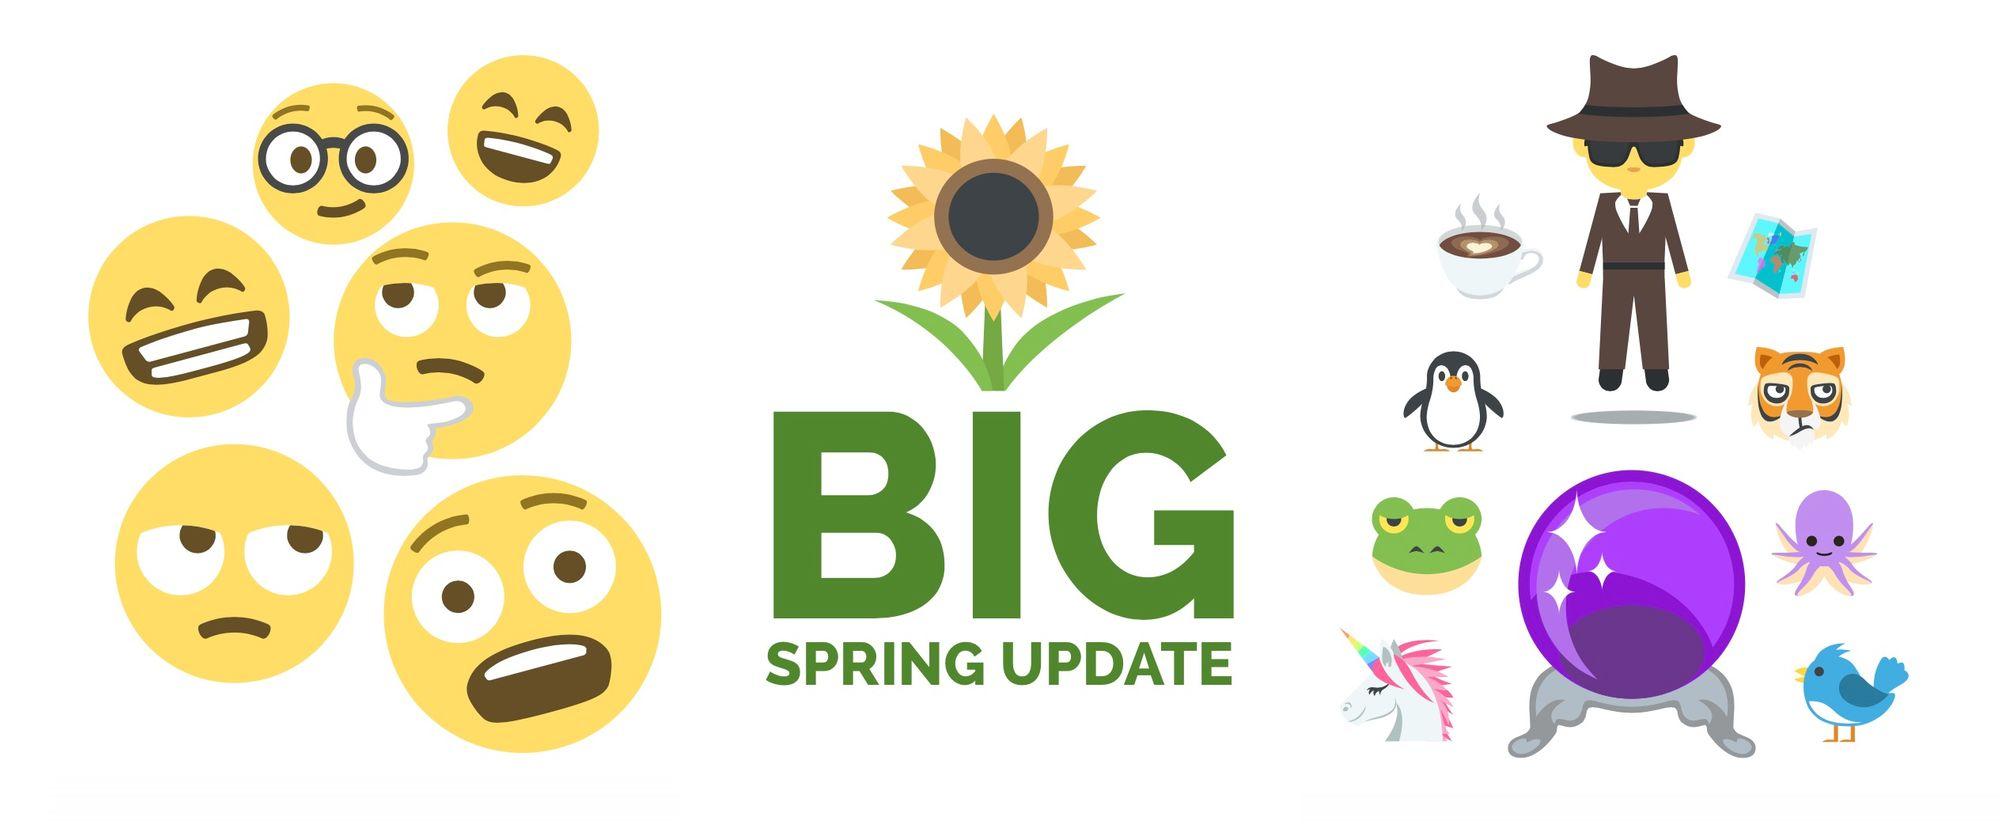 Emoji One Releases Big Spring Update